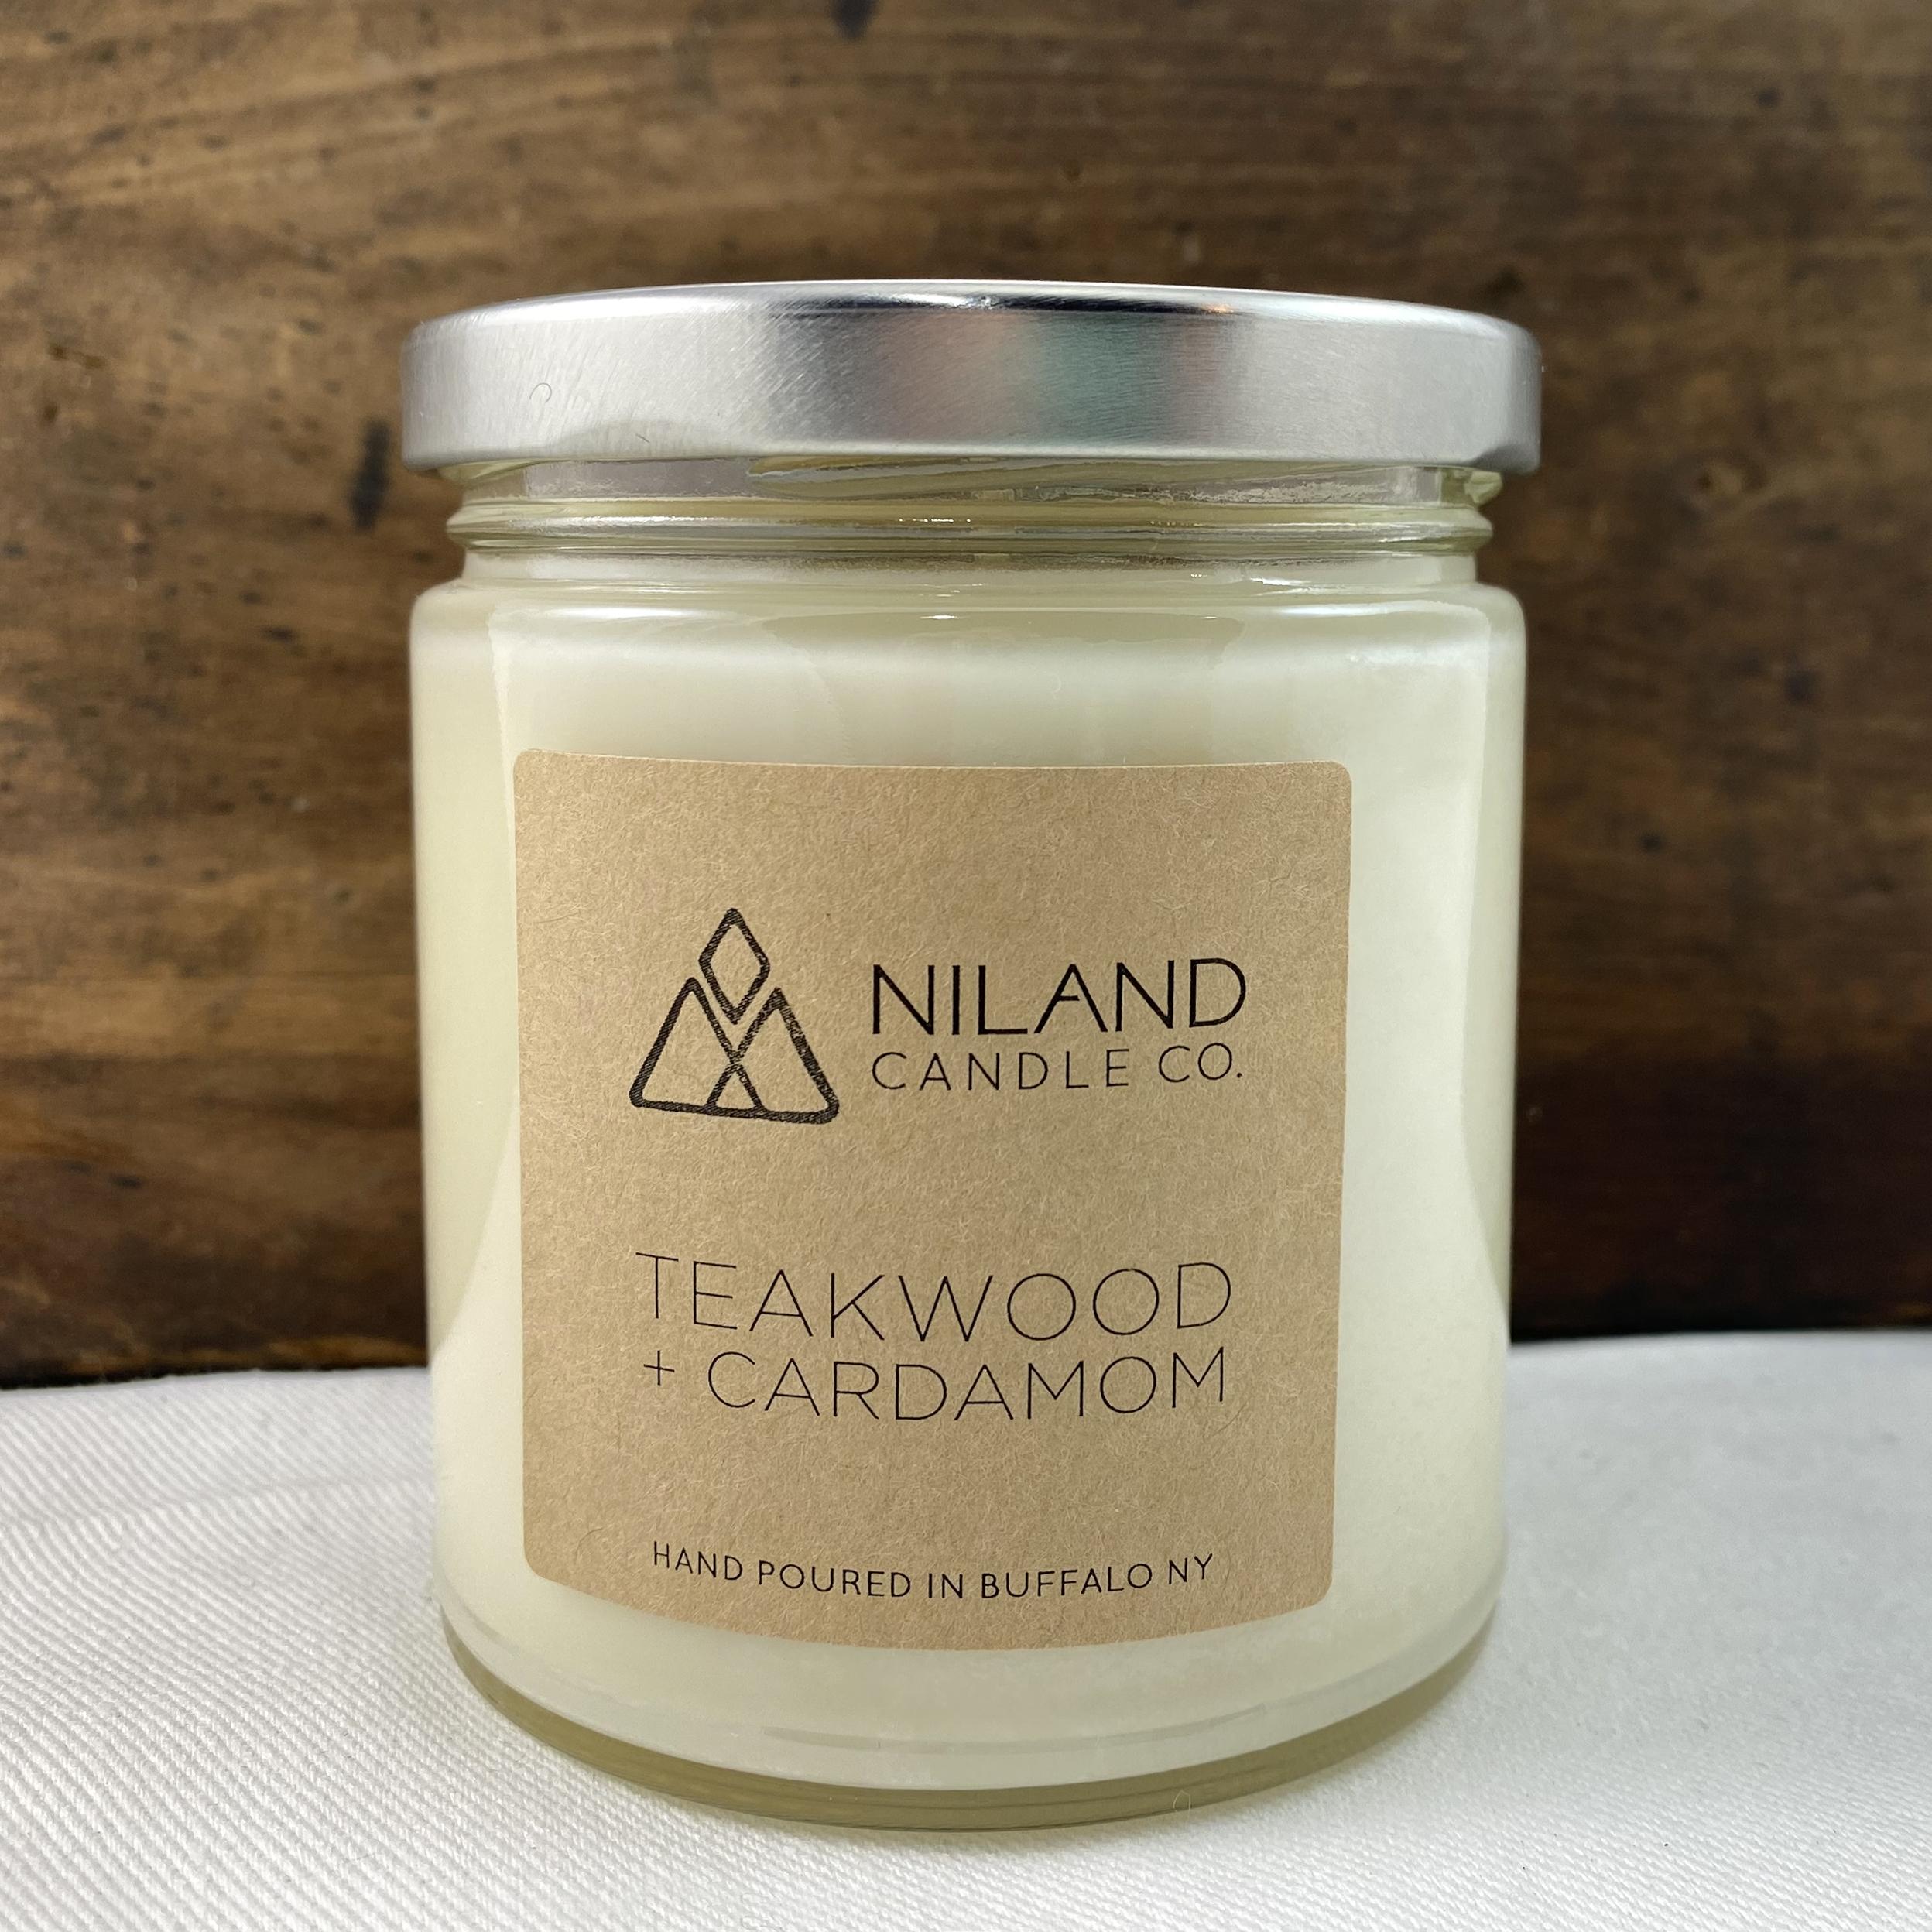 teakwood cardamom soy candle made in buffalo ny gift shop